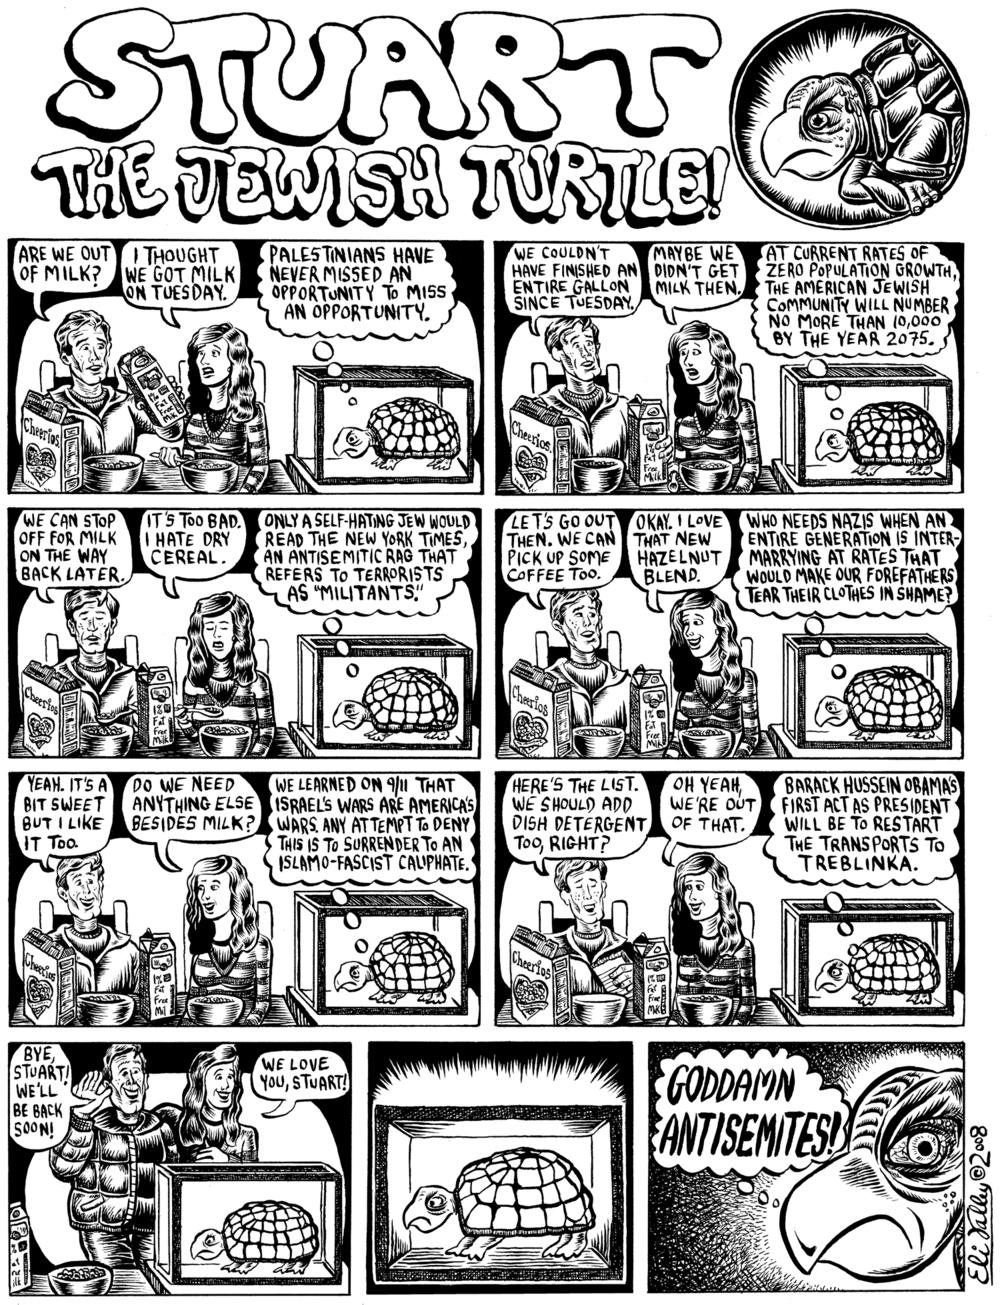 Stuart The Jewish Turtle. The Forward, 12/31/08